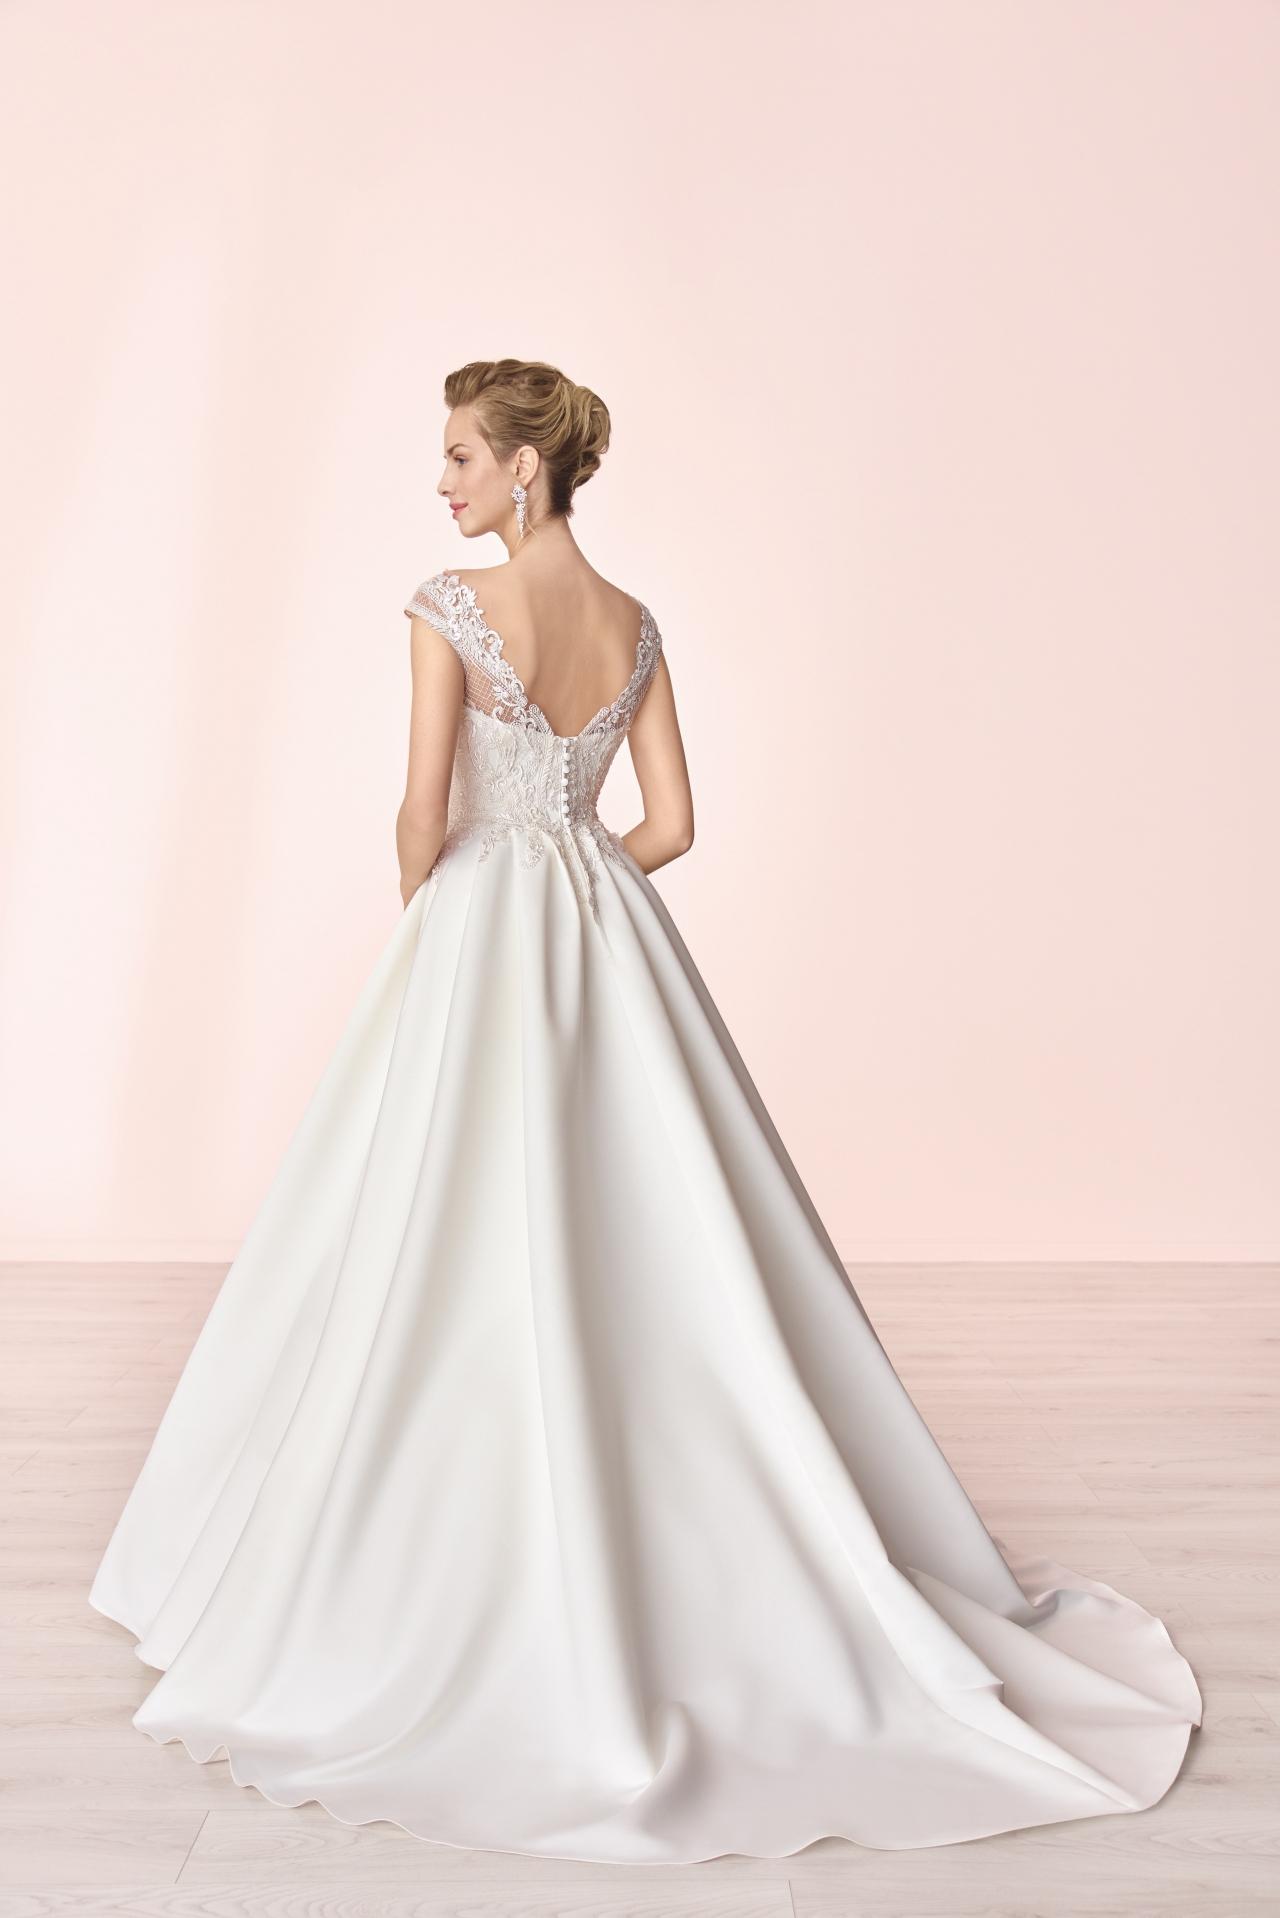 Brautkleid Elizabeth Konin 2019 - 4105T-2